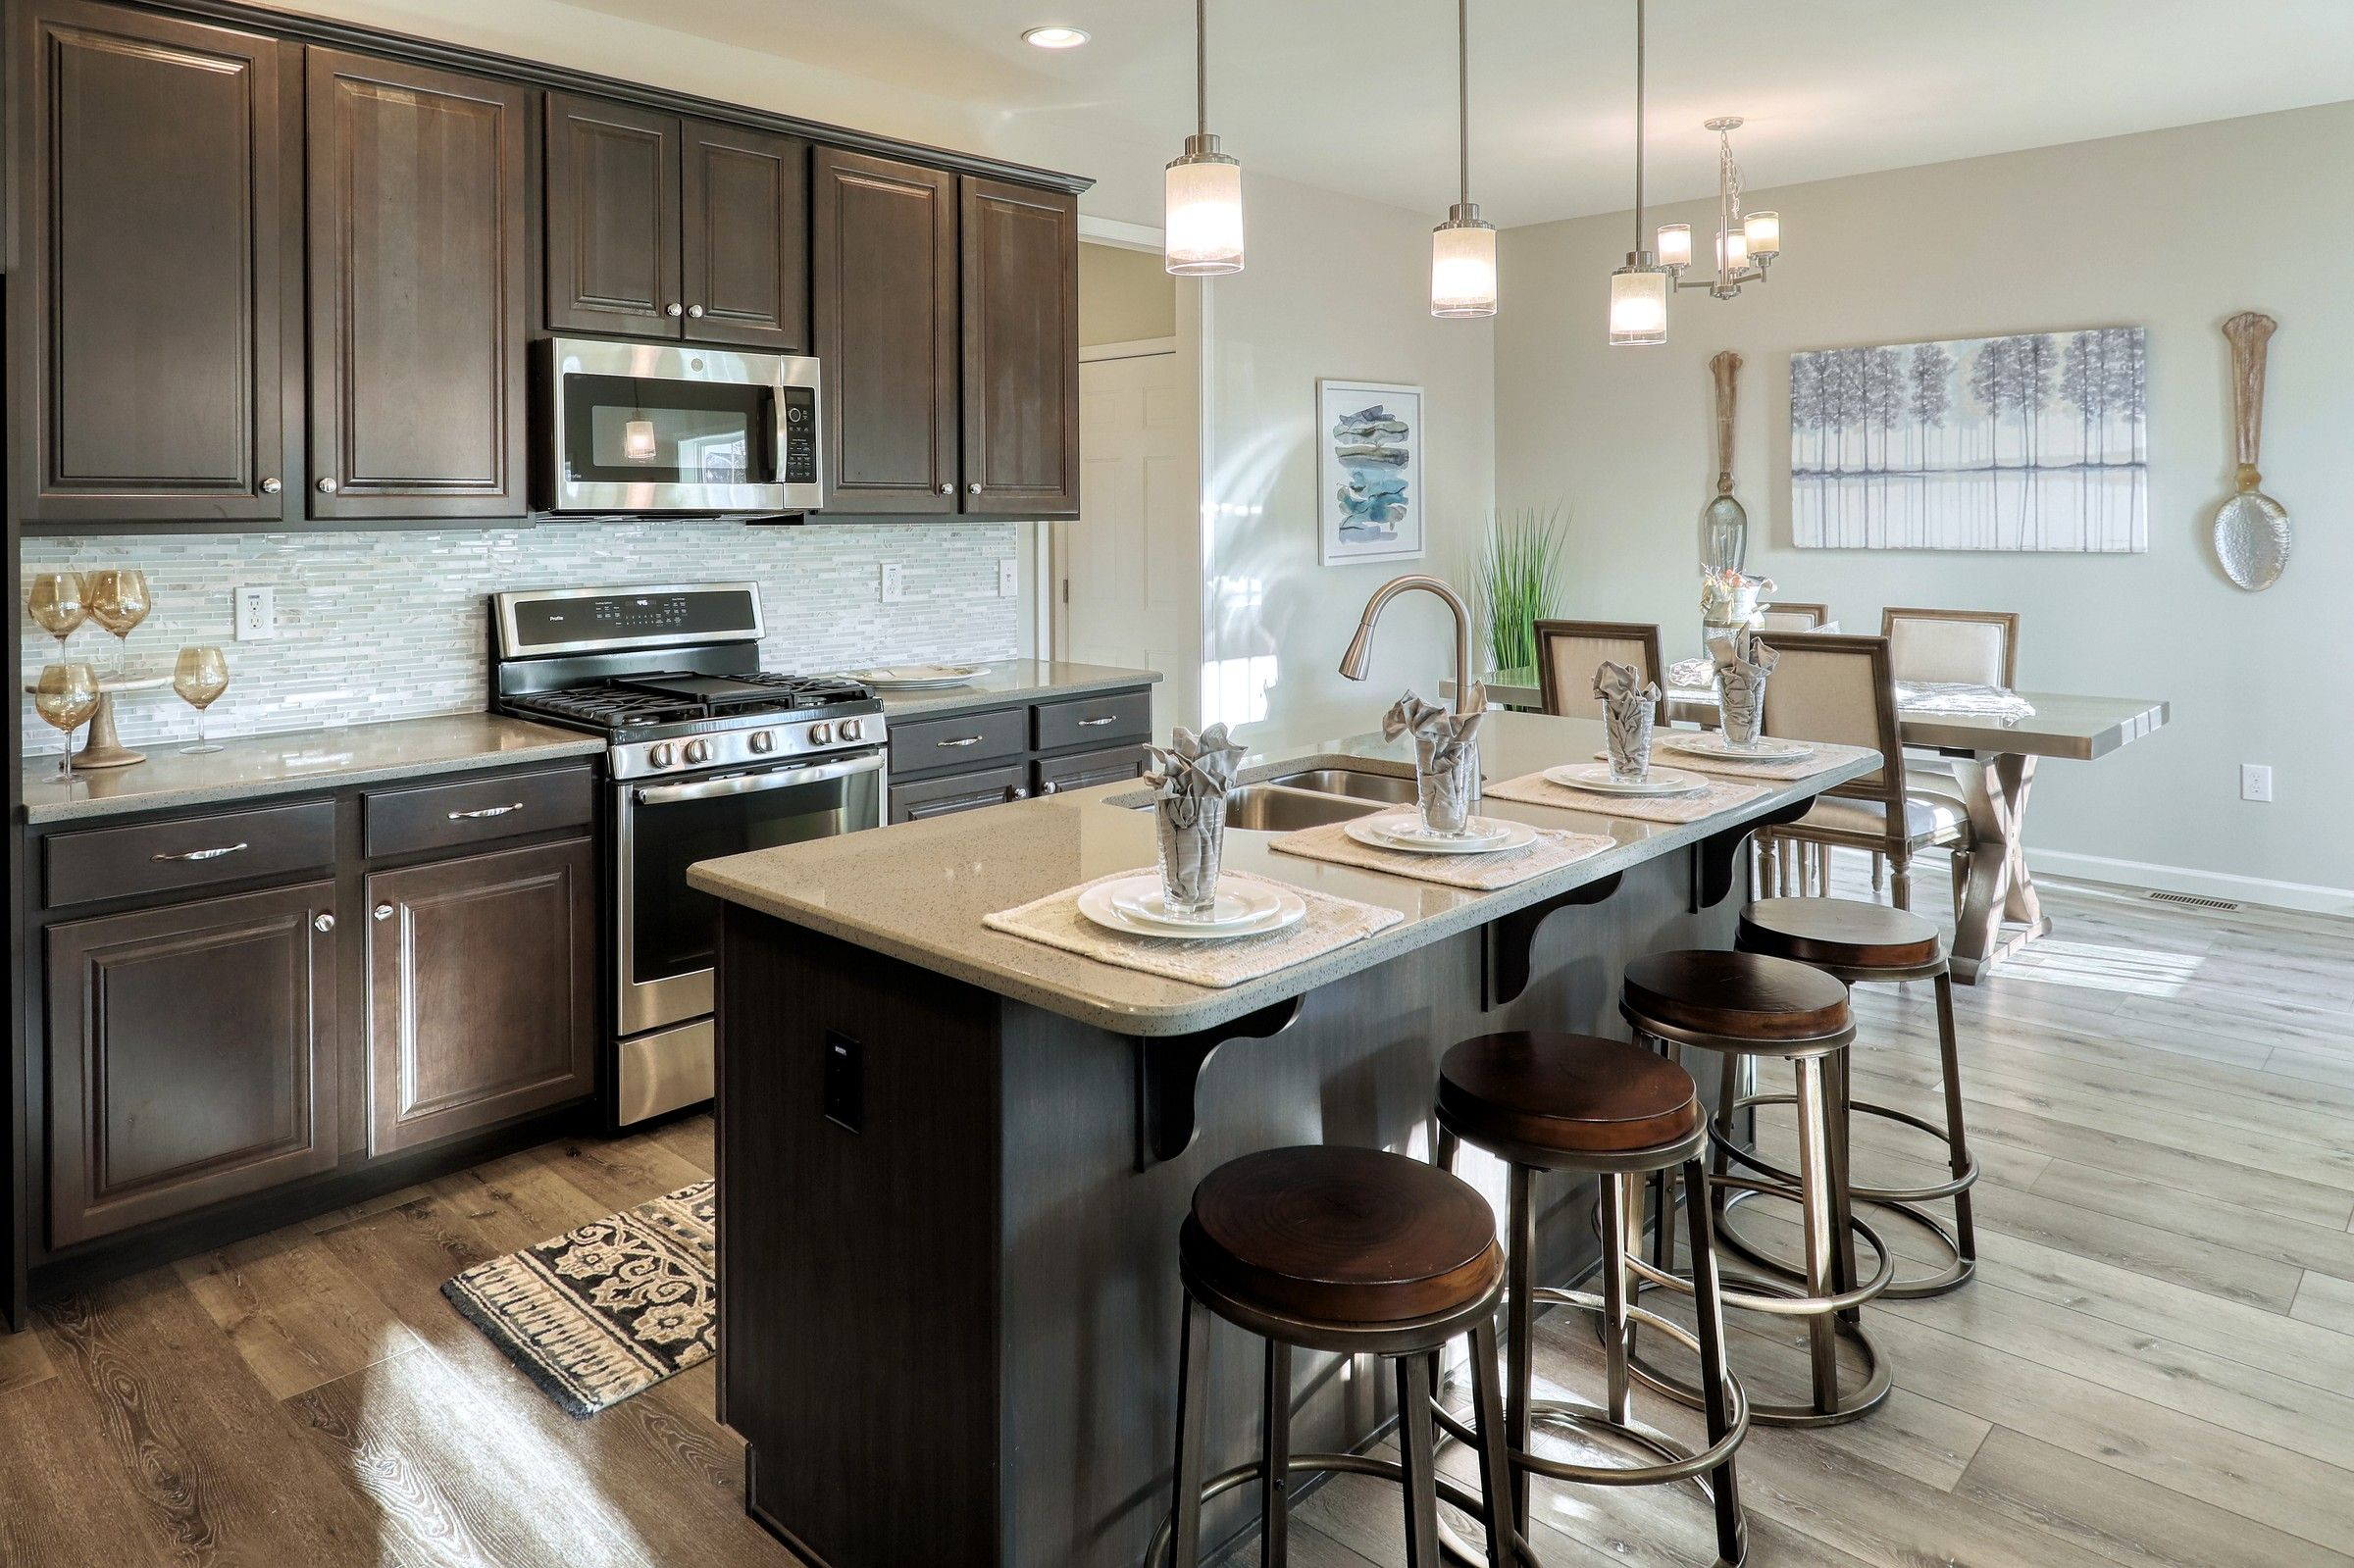 Kitchen featured in the Wyndham Vintage By Keystone Custom Homes in Washington, MD